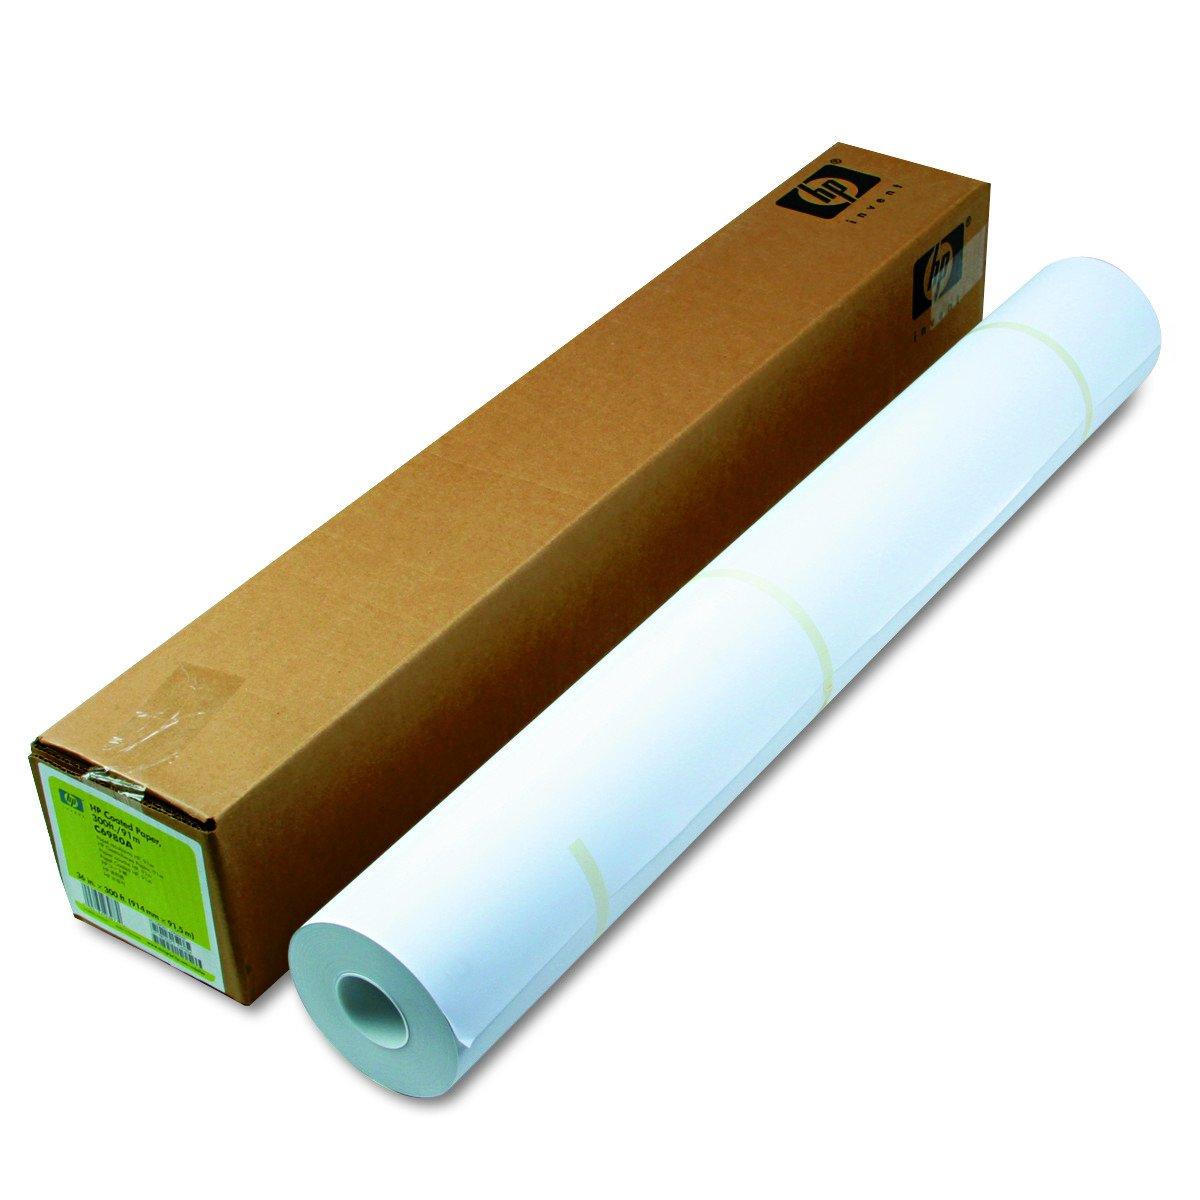 HP C6980A Designjet Inkjet Large Format Paper, 4.5 mil, 36'' x 300 ft, White